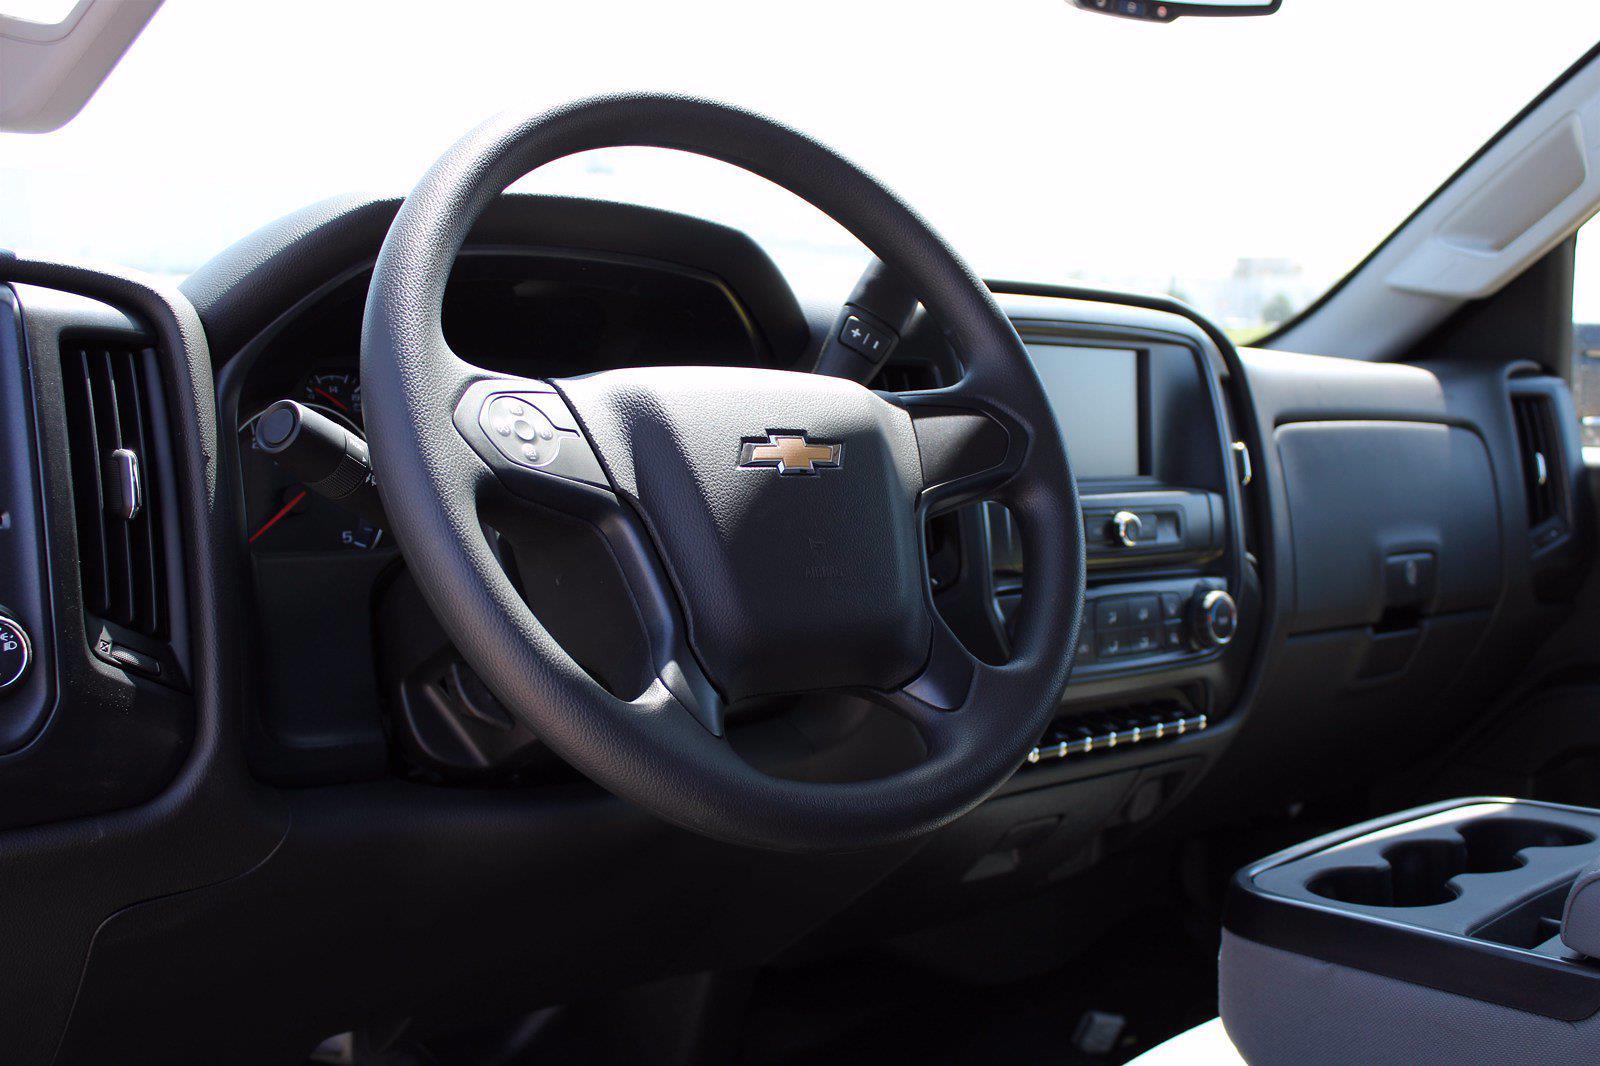 2020 Chevrolet Silverado 5500 DRW 4x2, Cab Chassis #D100457 - photo 4